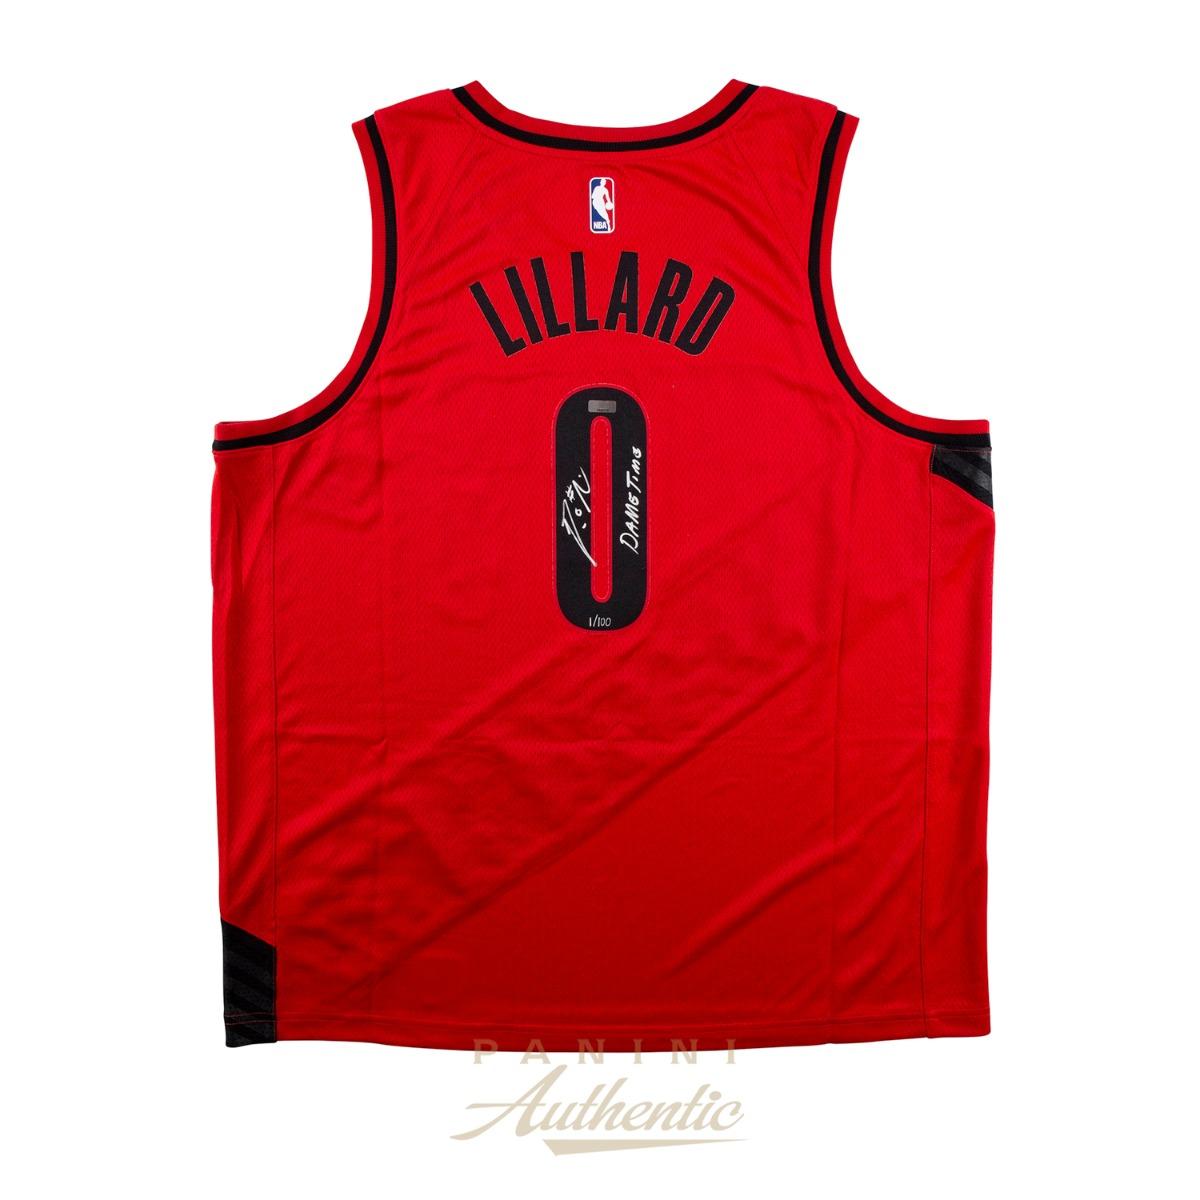 Damian Lillard Autographed Portland Trailblazers Red Nike Swingman Jersey With Dame Time Inscription Limited Edition To 100